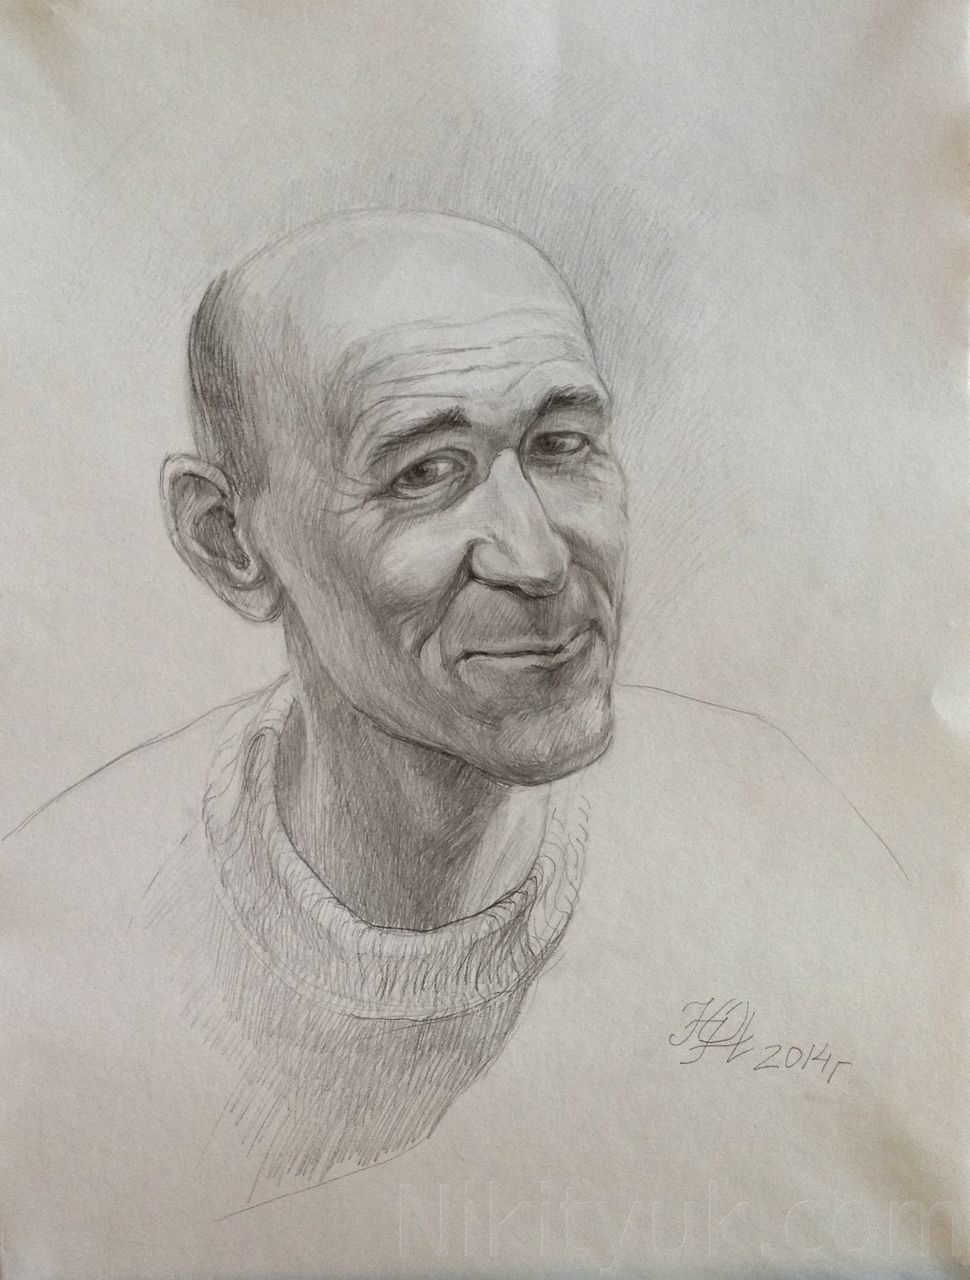 Портрет мужчины, бум., карандаш, 60х40см, 2014г.